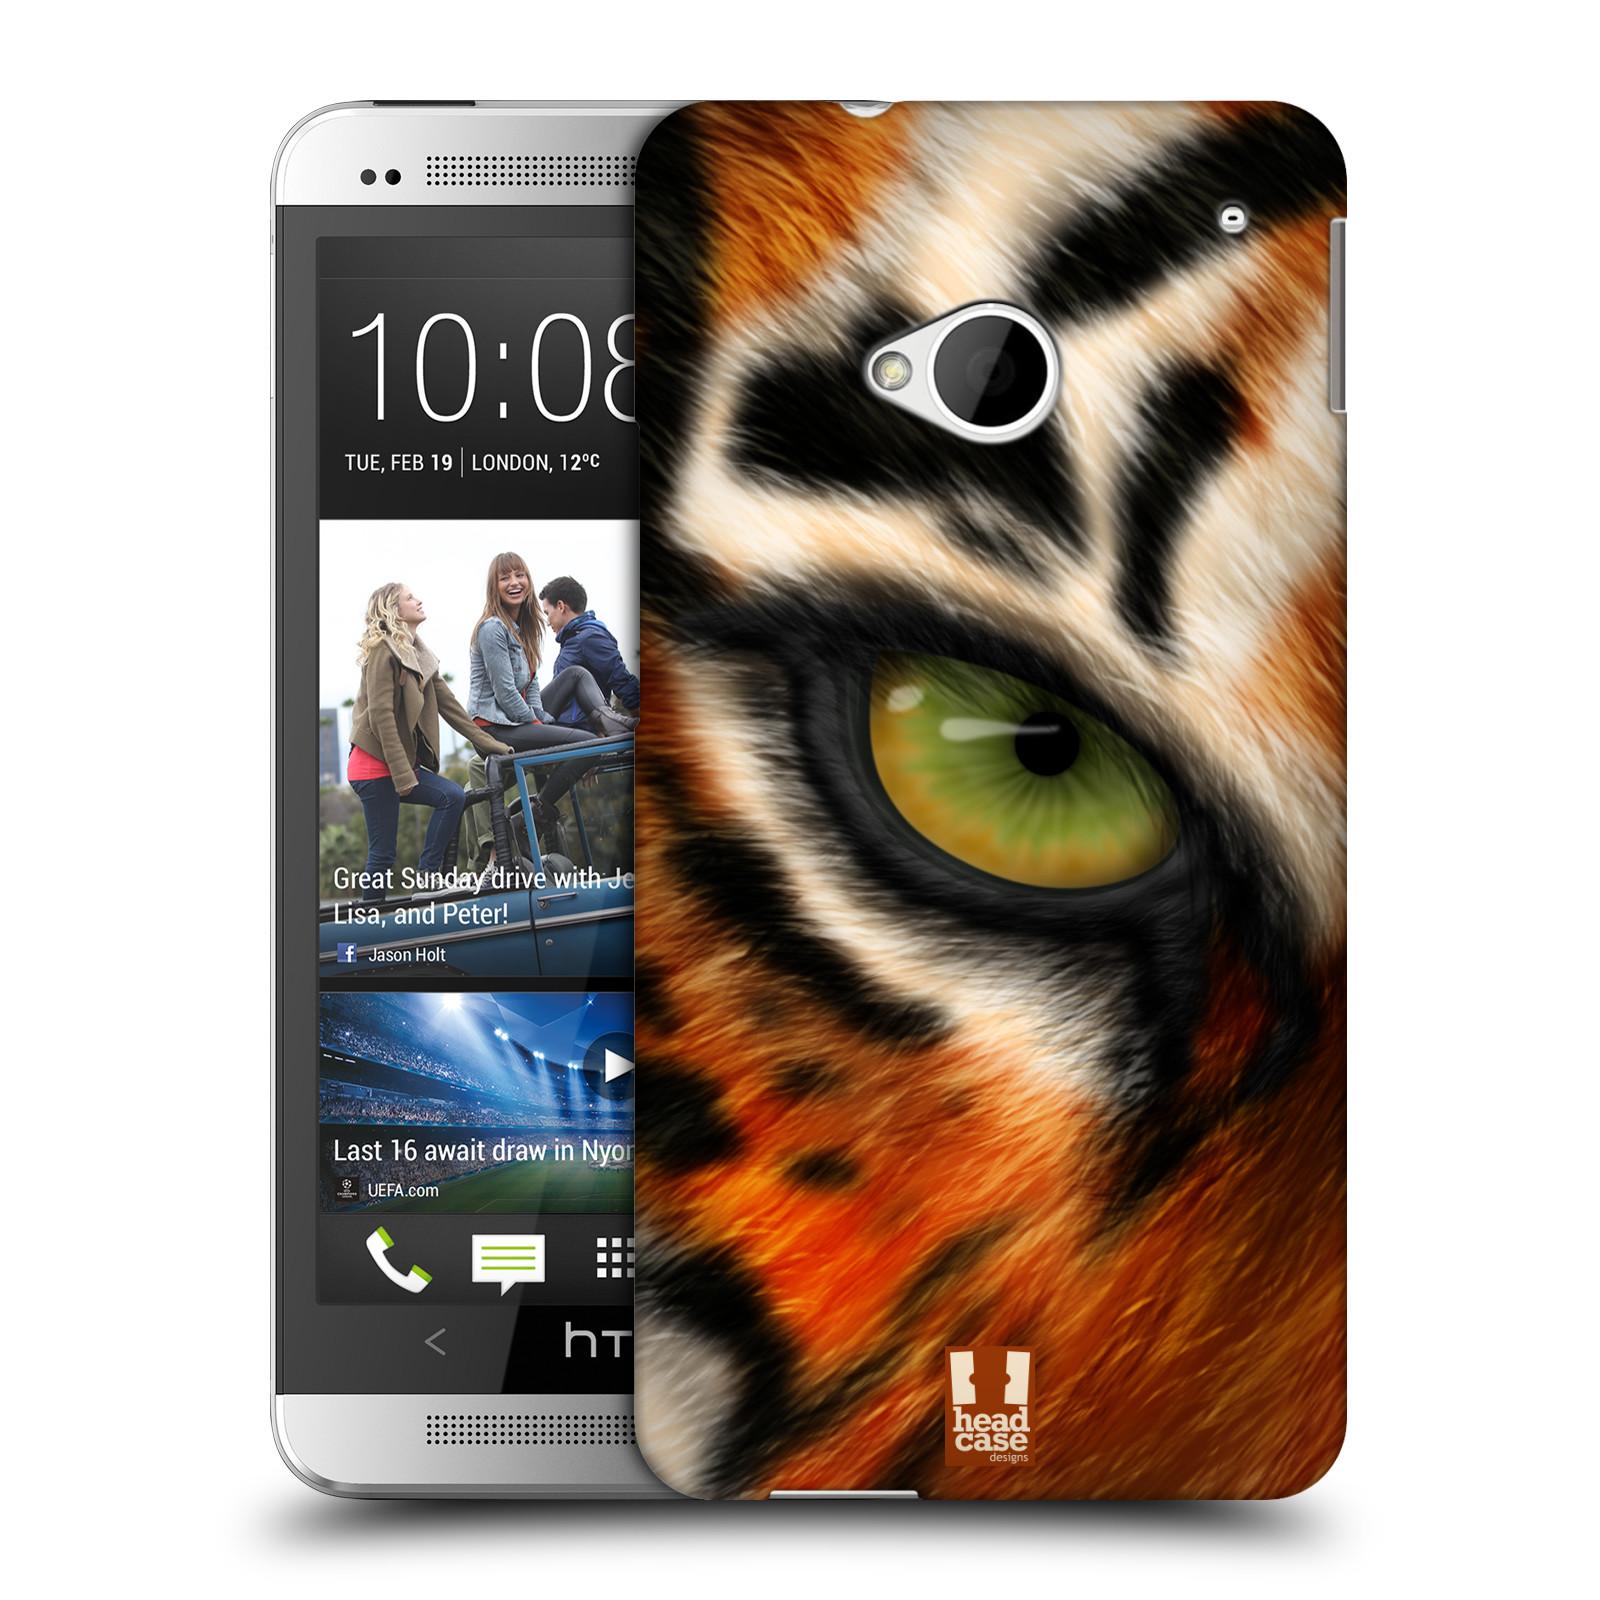 HEAD CASE plastový obal na mobil HTC One (M7) vzor pohled zvířete oko tygr